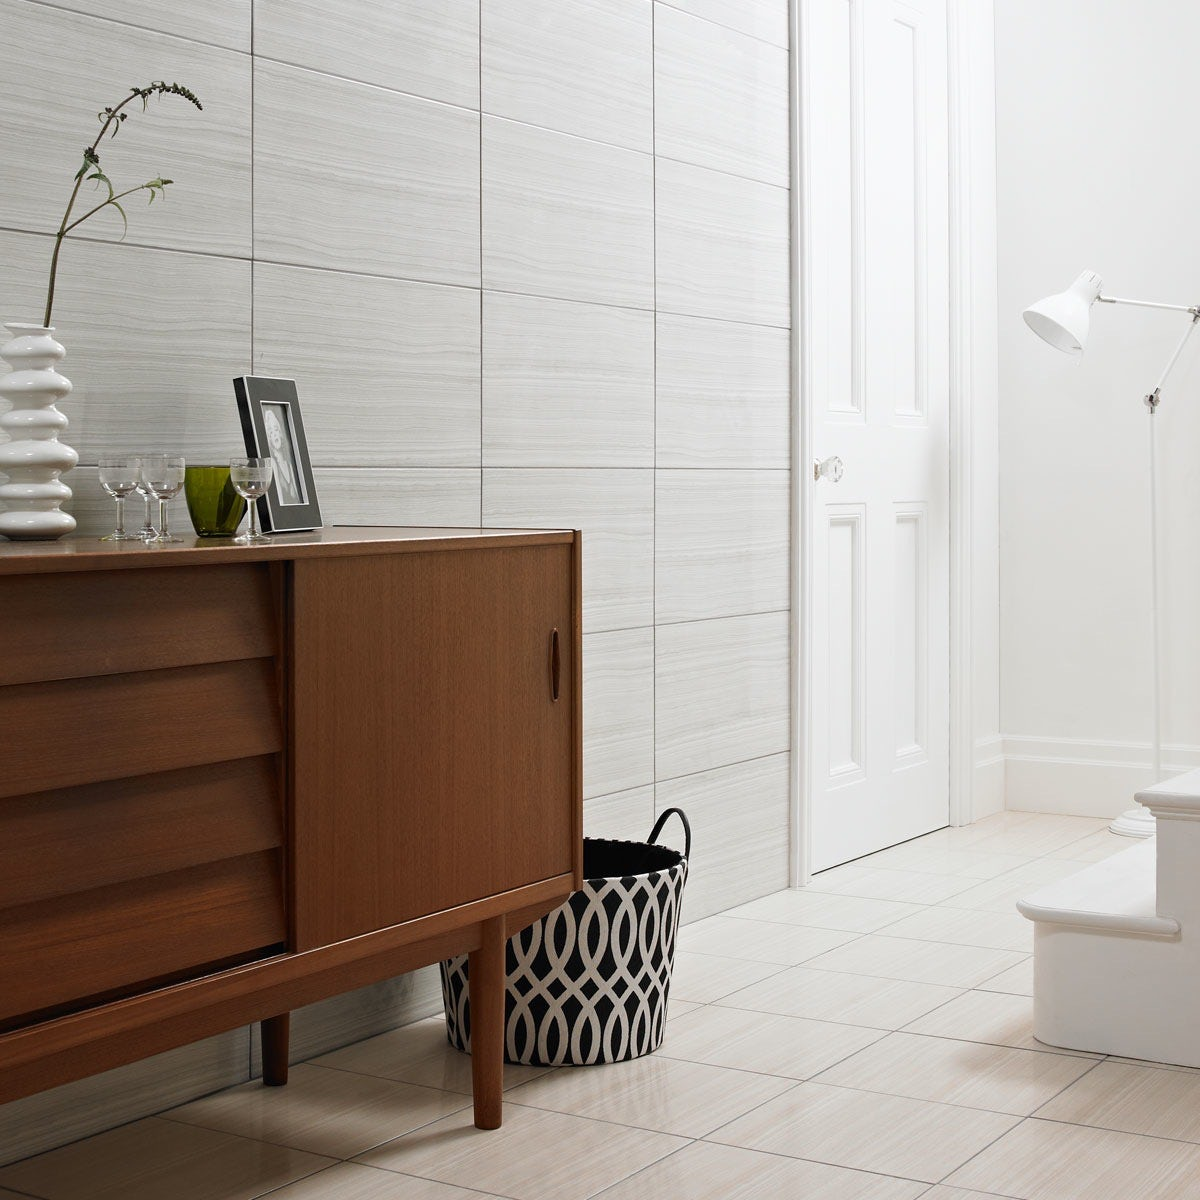 Tiles inspiration gallery | VictoriaPlum.com